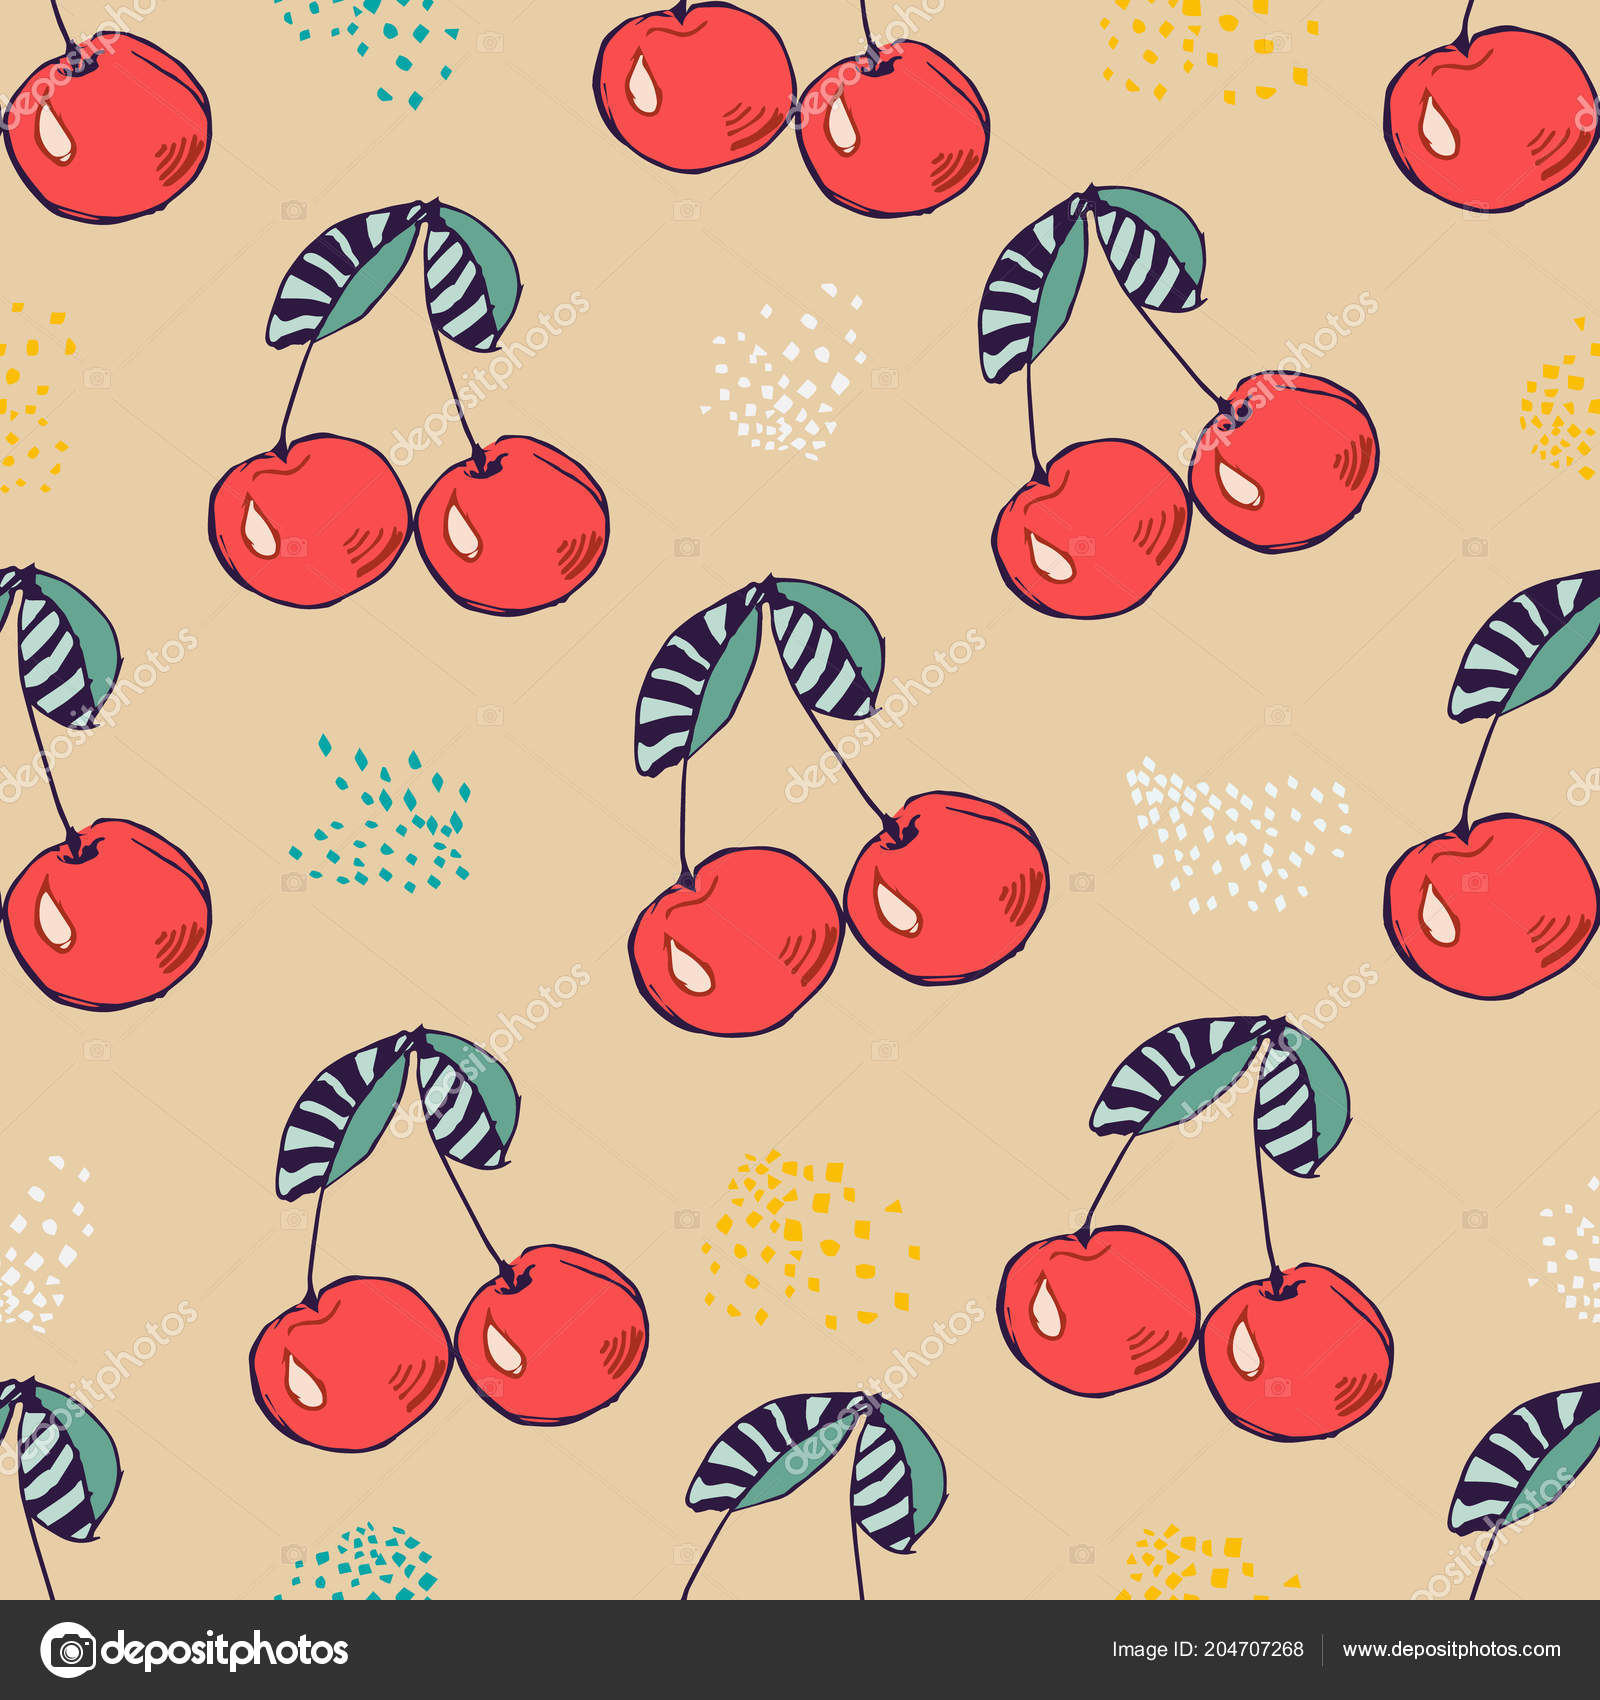 Seamless pattern of pink cherry vector illustration for design seamless pattern of pink cherry vector illustration for design birthday card party invitation stopboris Gallery